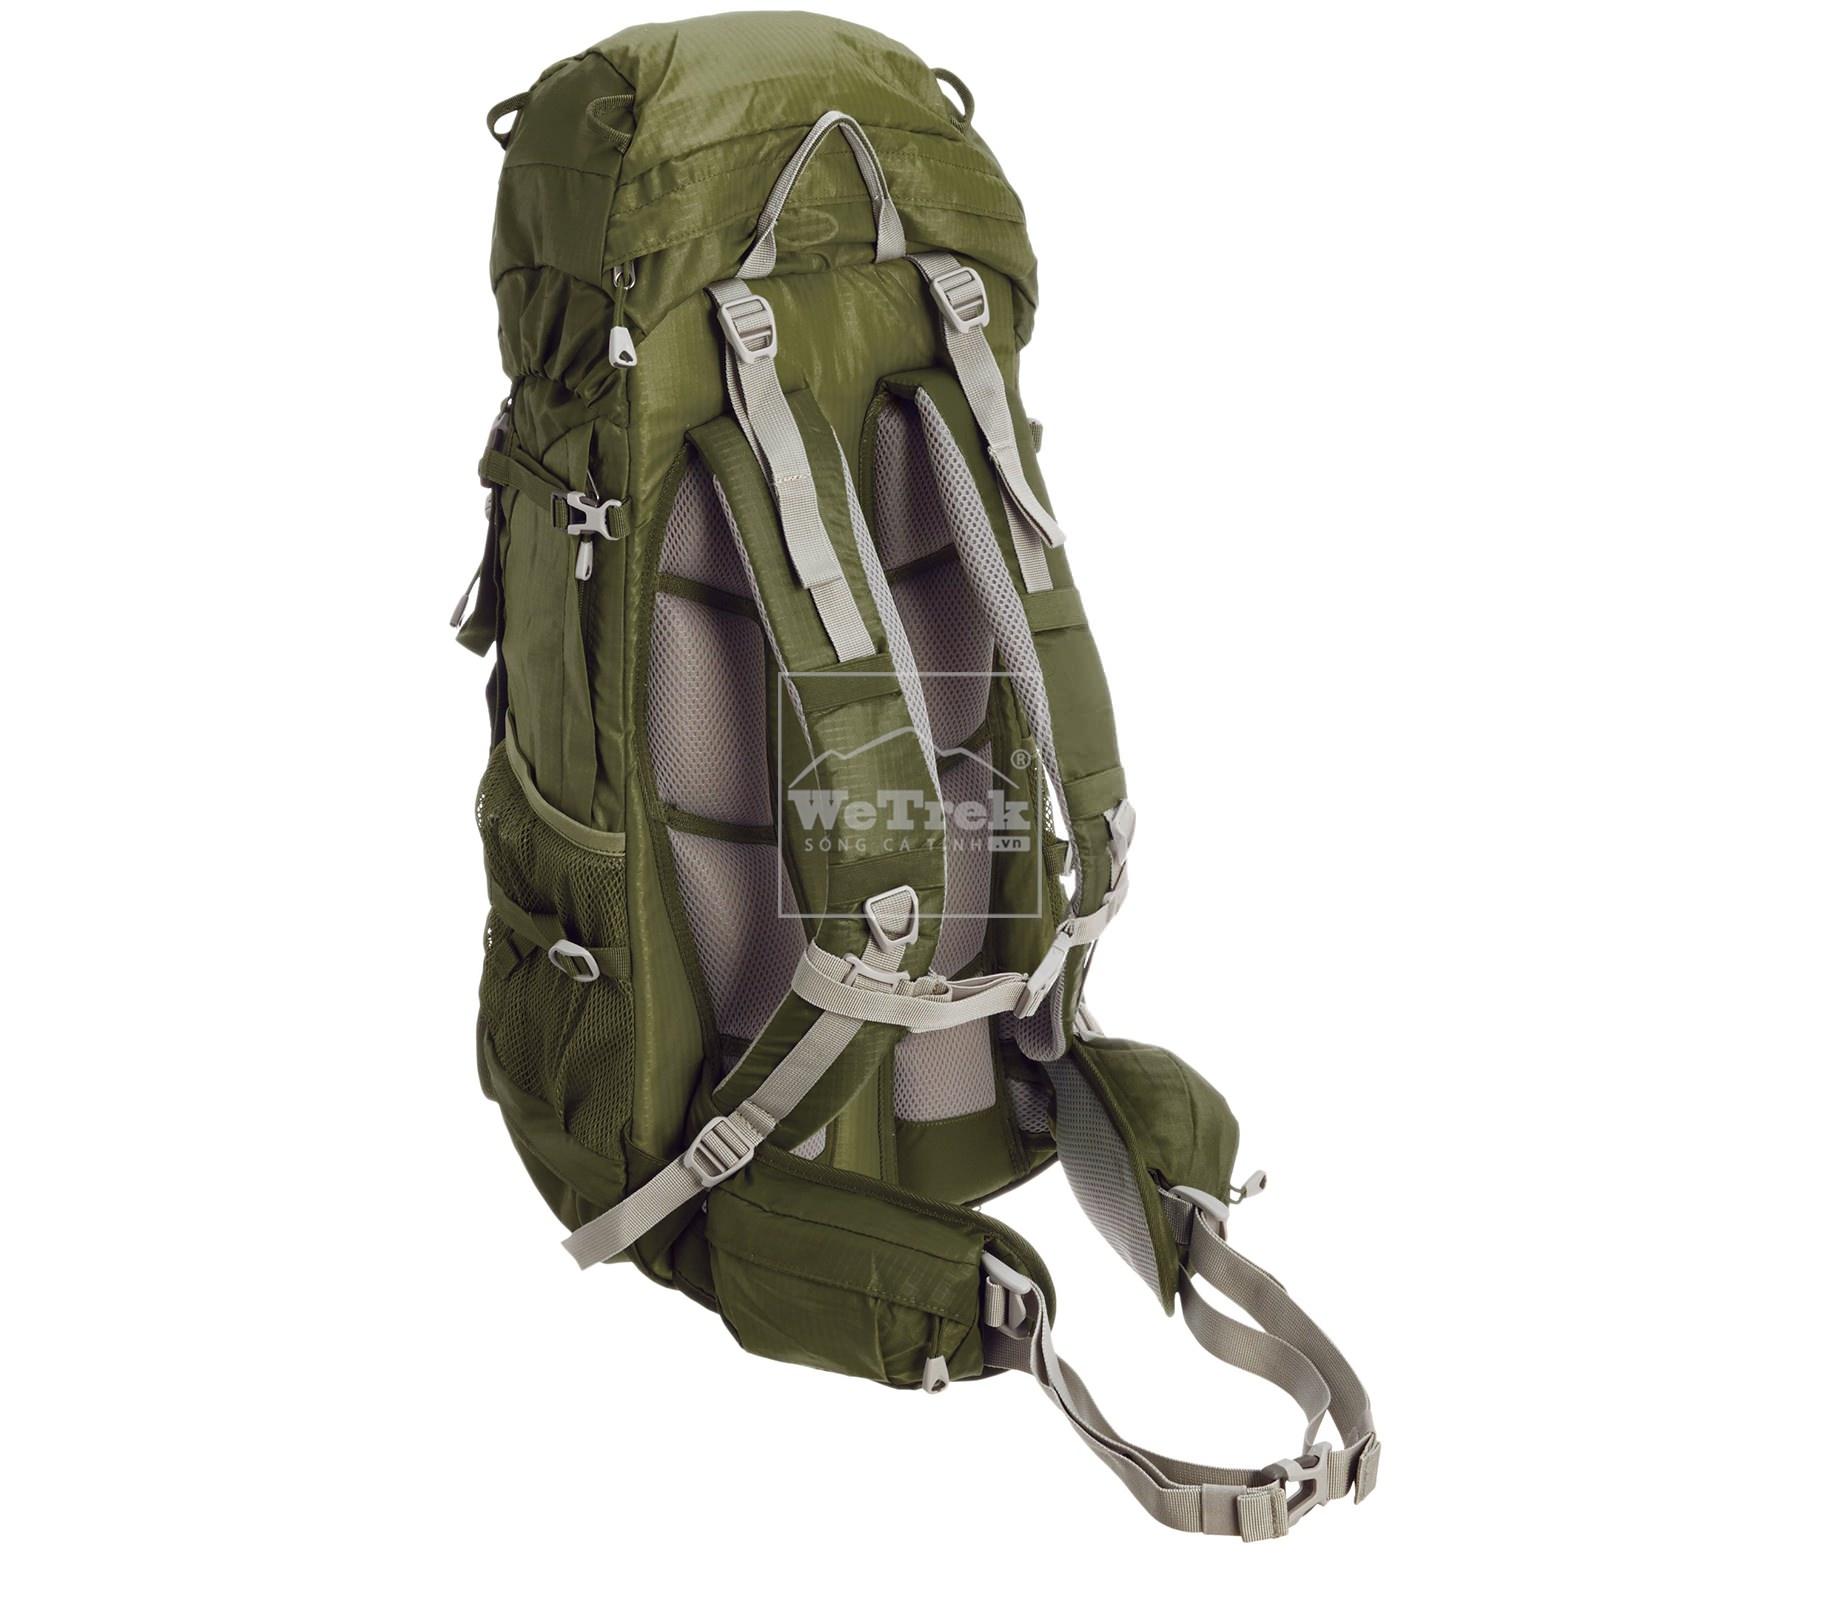 ba-lo-leo-nui-30l-coleman-mttrek-lite-backpack-green-cbb4071gr-7458-wetrek.vn-1